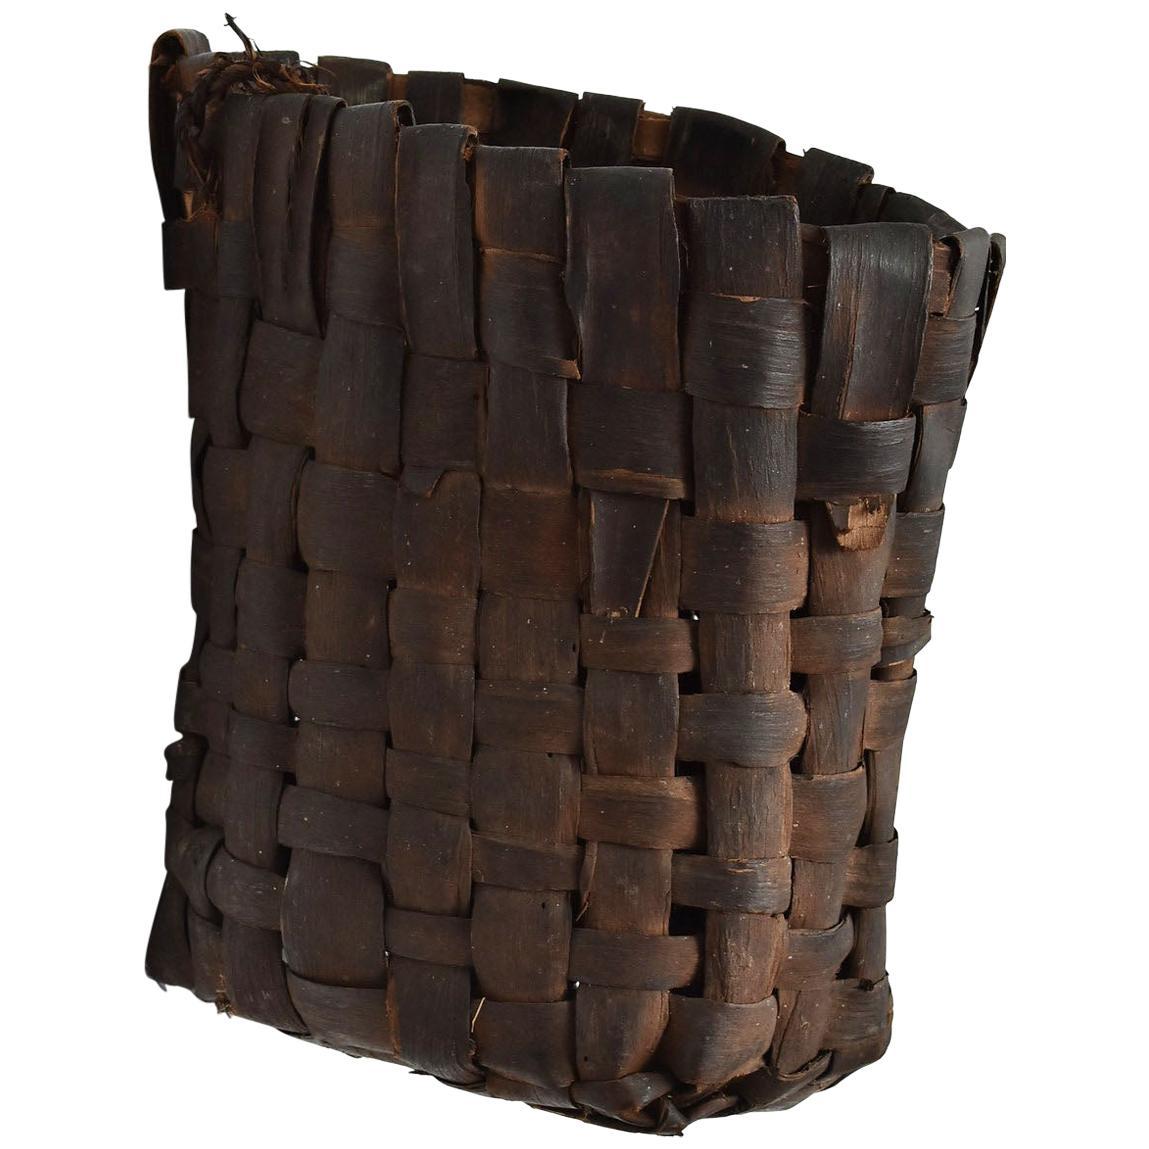 Japanese Antique Farming Tools / Basket Made of Bark / Wall-Mounted Flower Vase